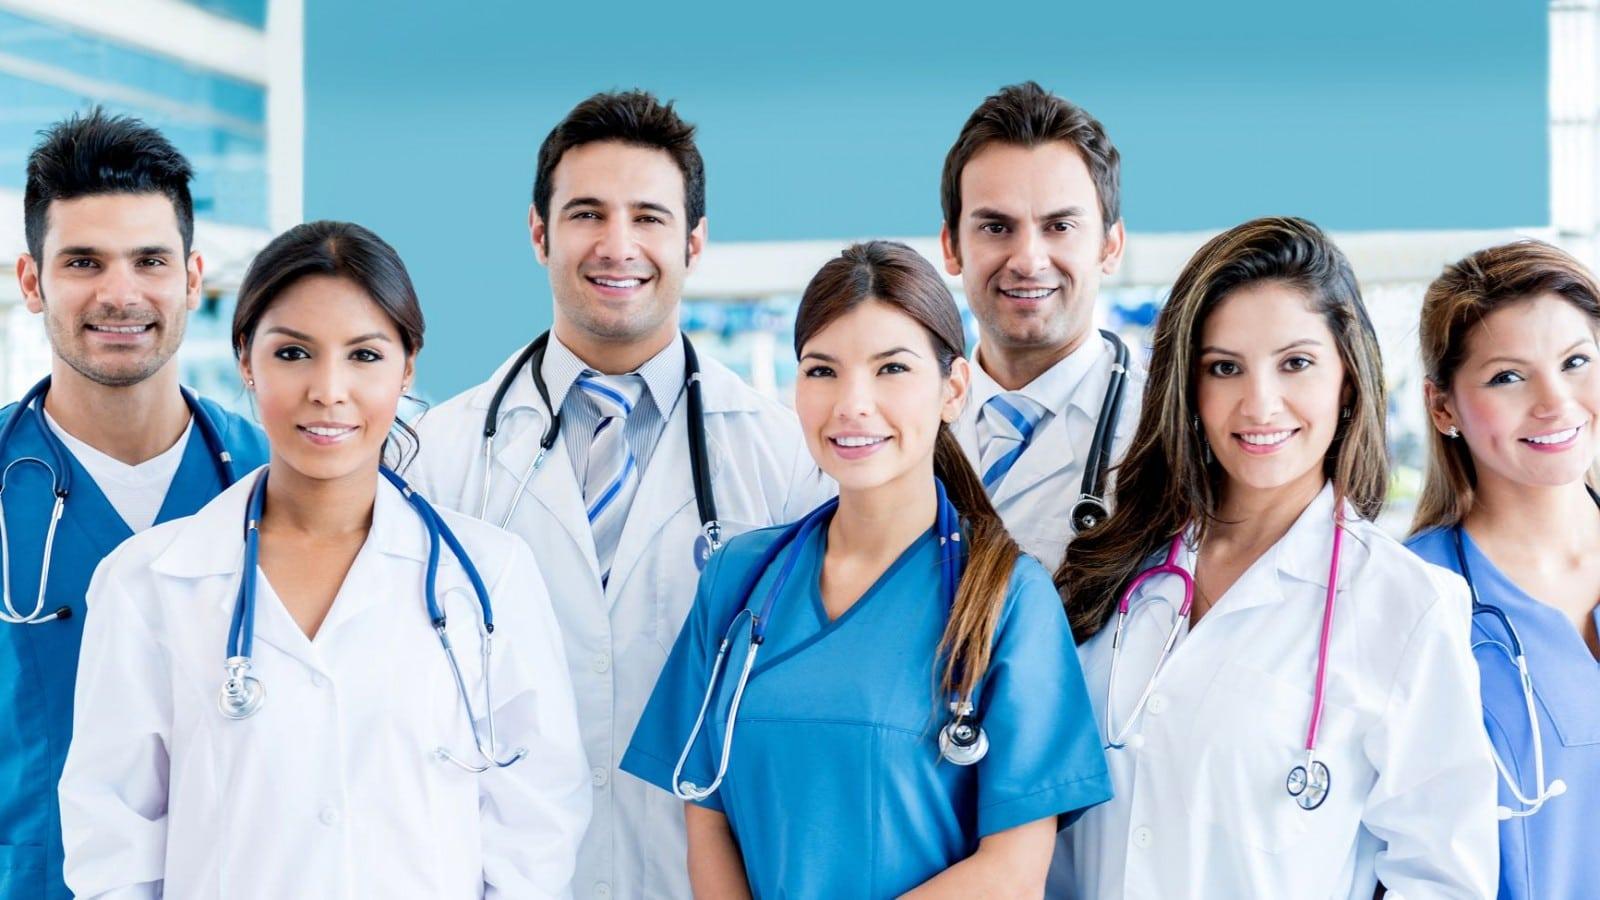 medic insurance 3